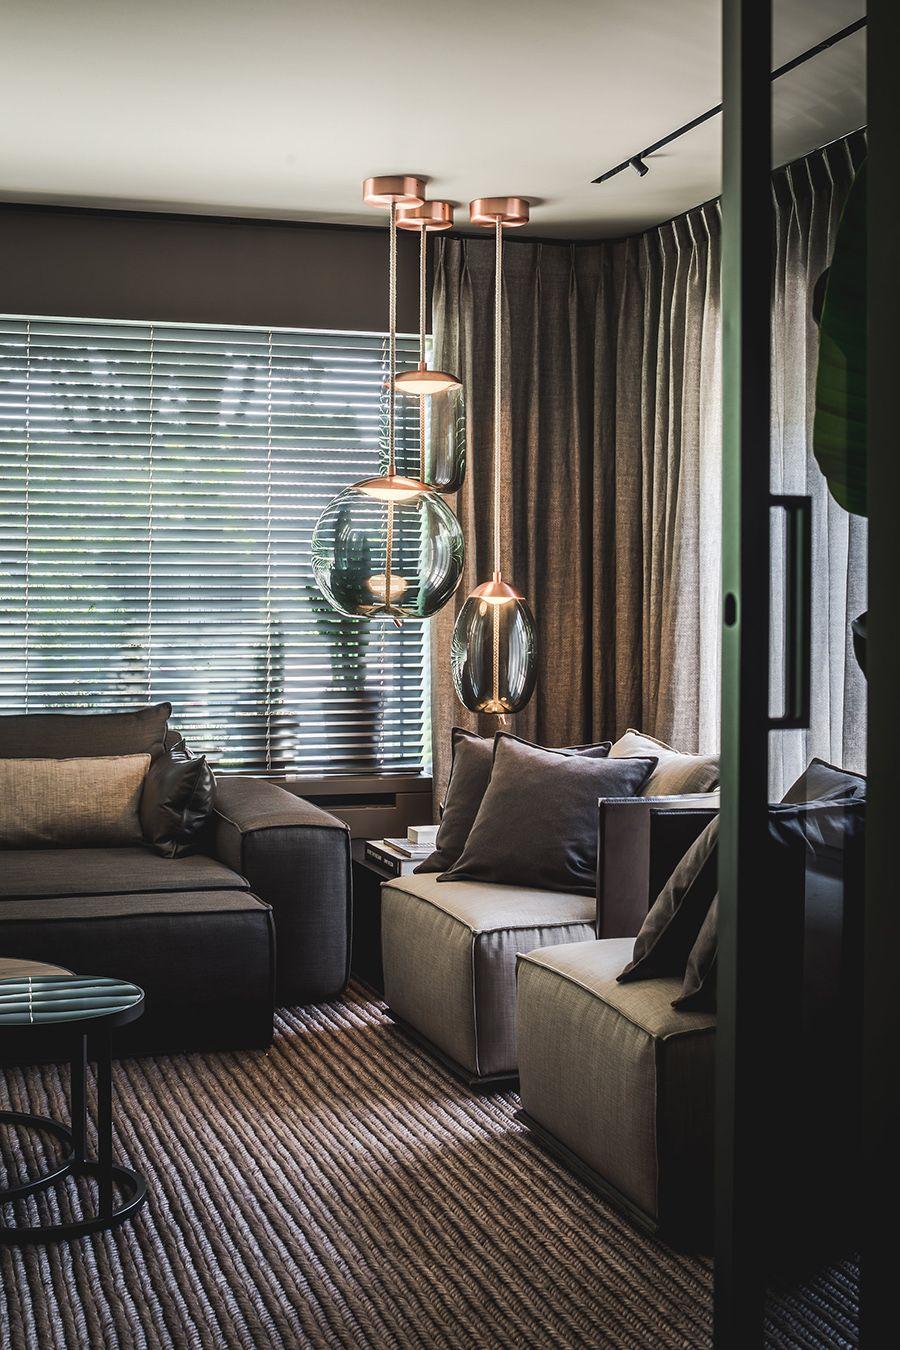 Liv Sofa Grey7 Huis Interieur Interieur Woonkamer Huis Interieur Design